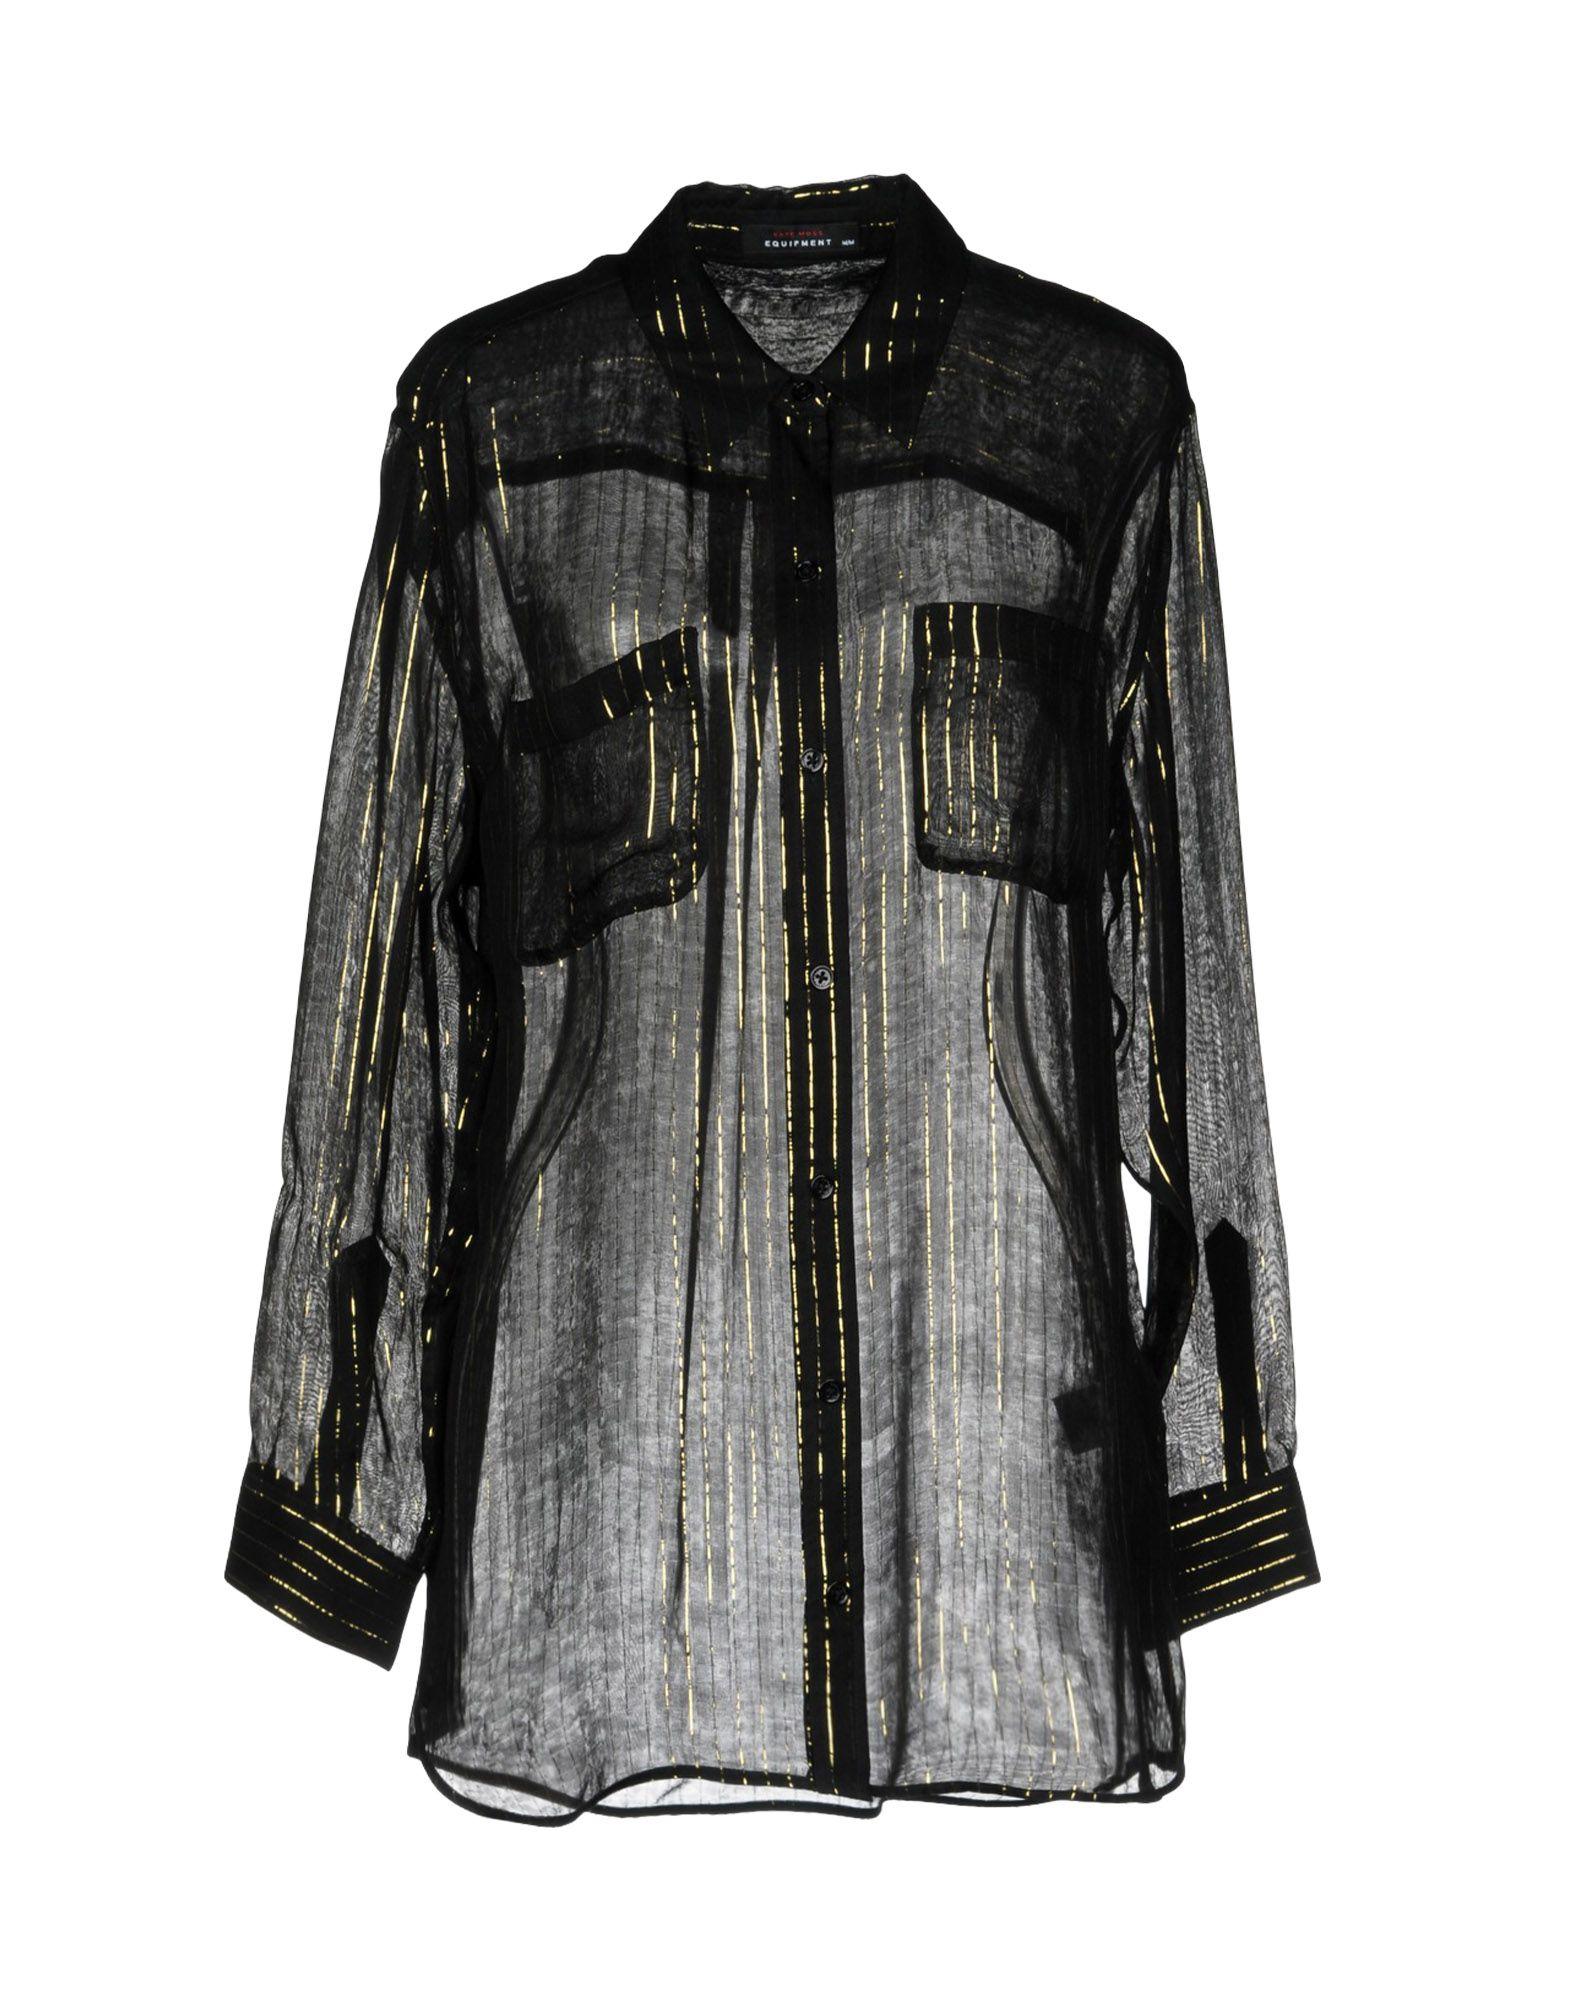 KATE MOSS EQUIPMENT Striped Shirt in Black